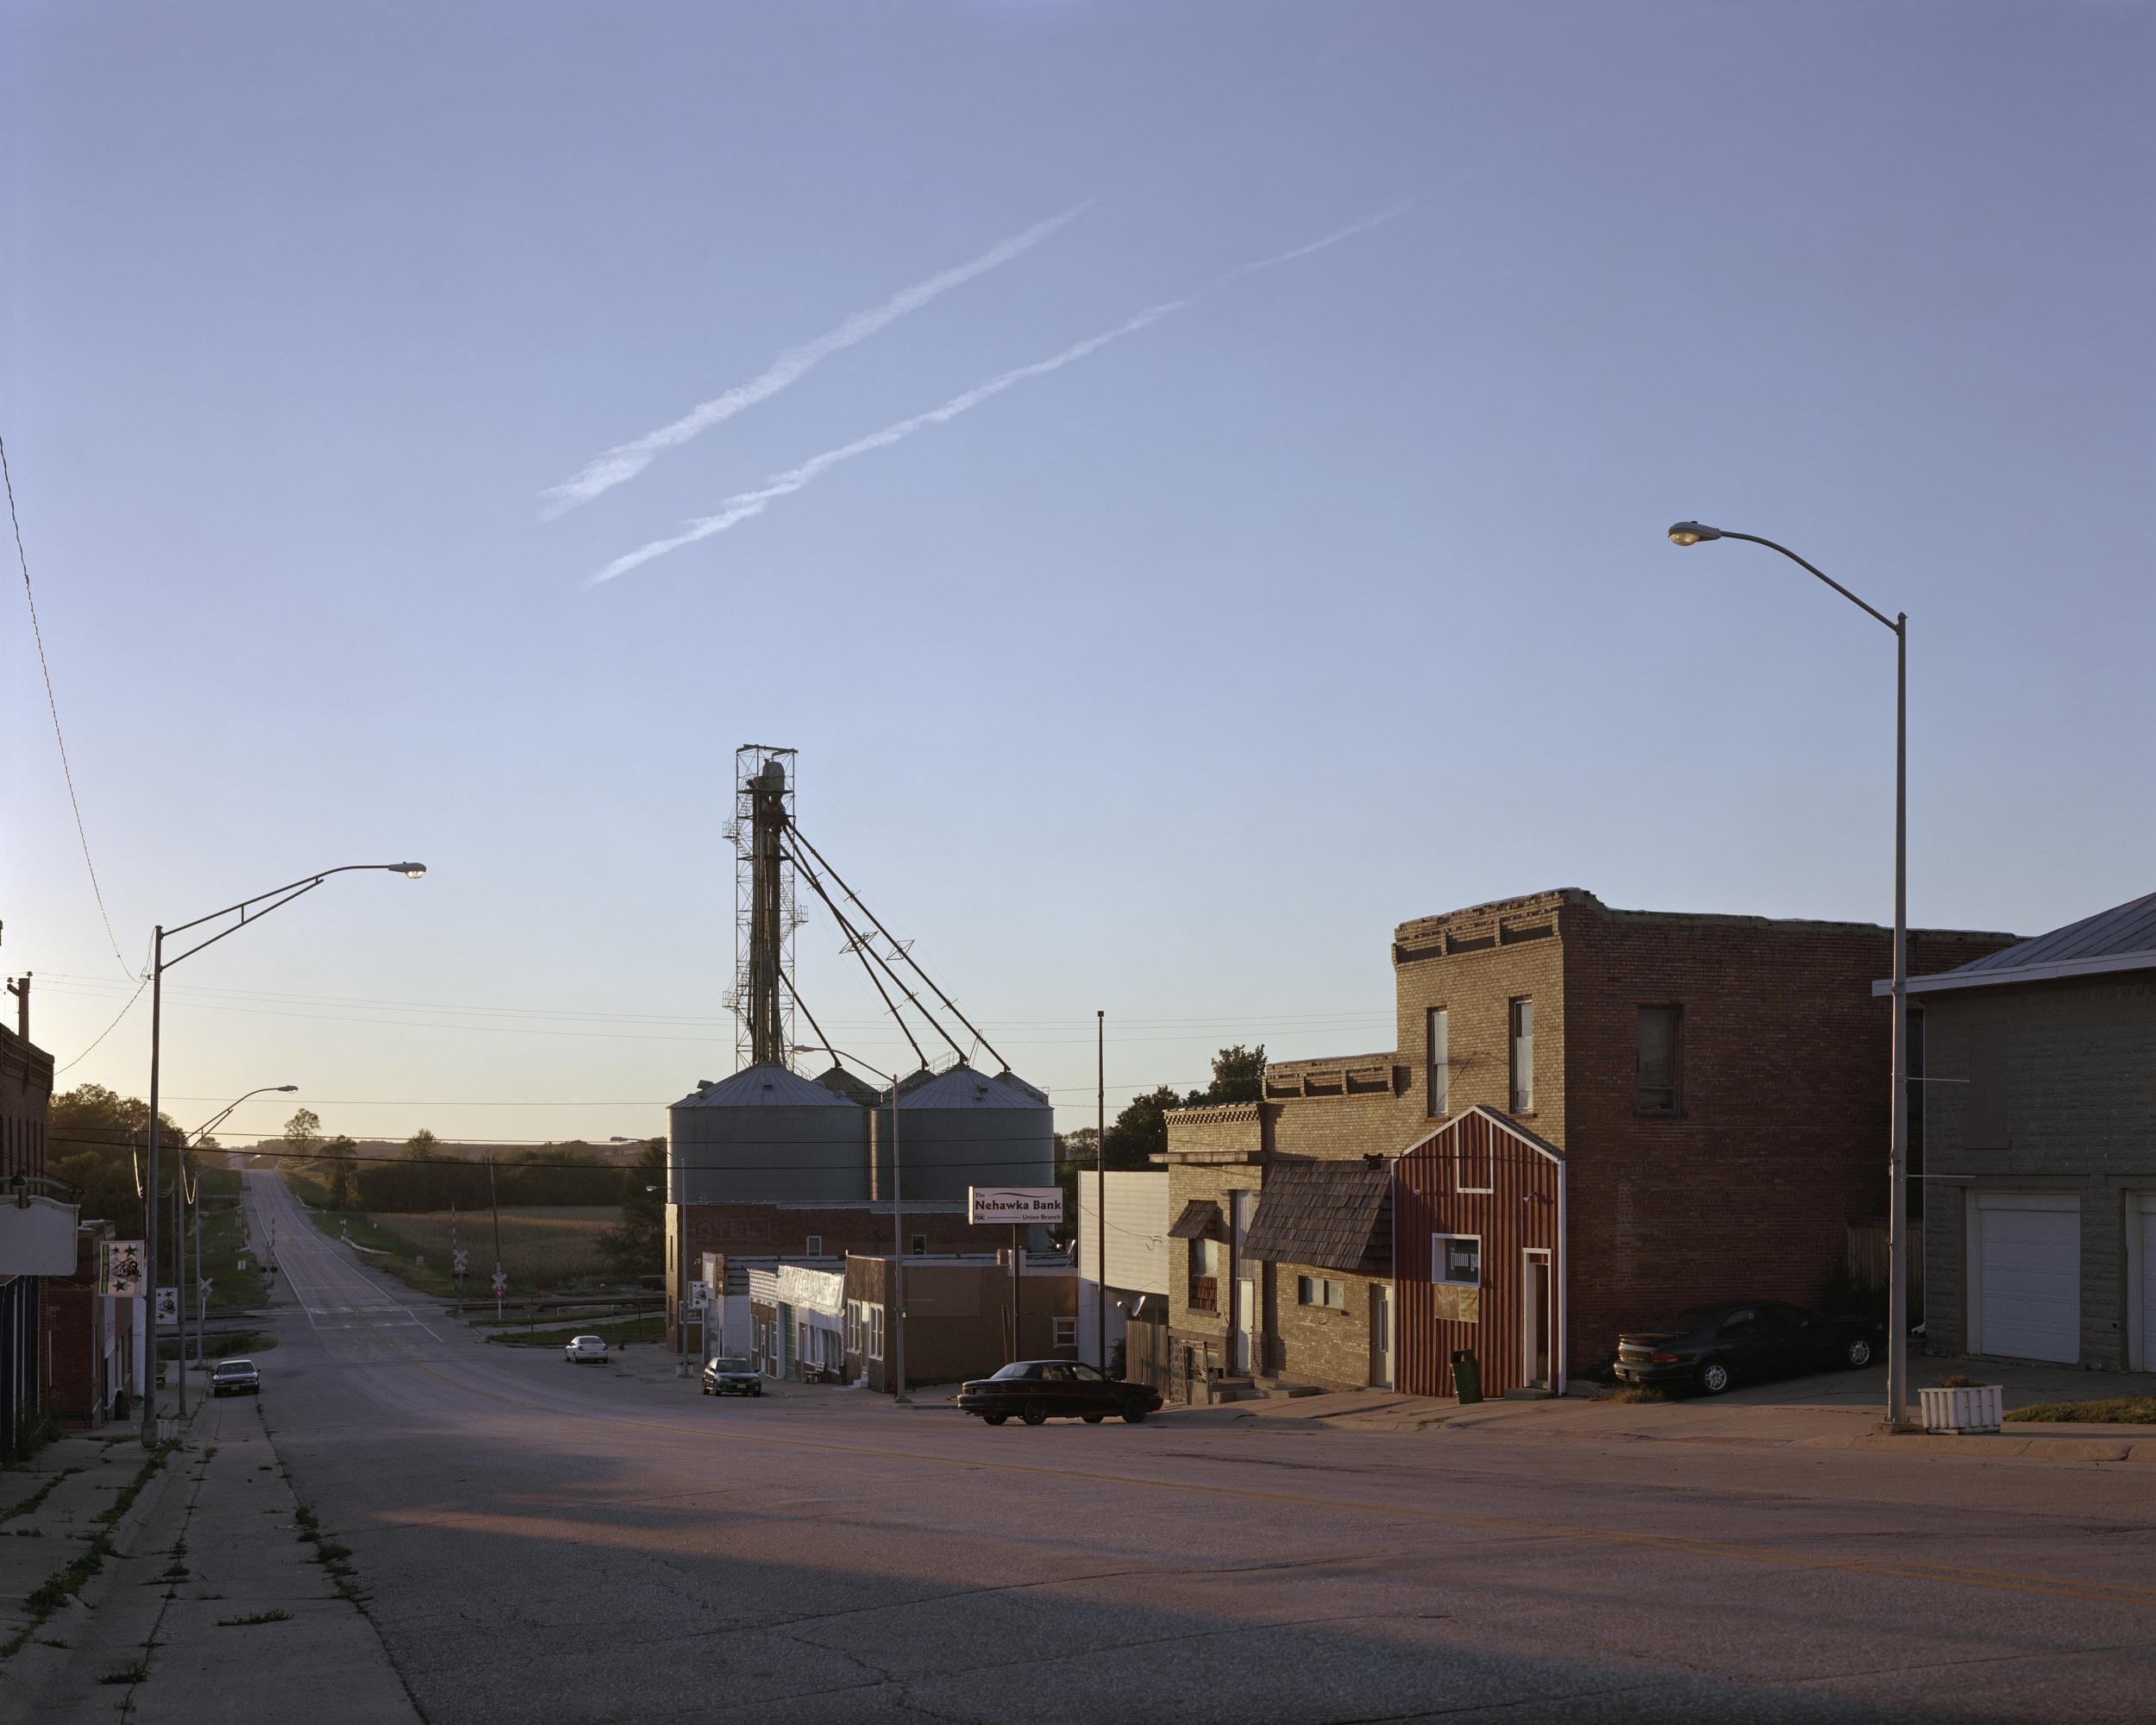 Union, Nebraska